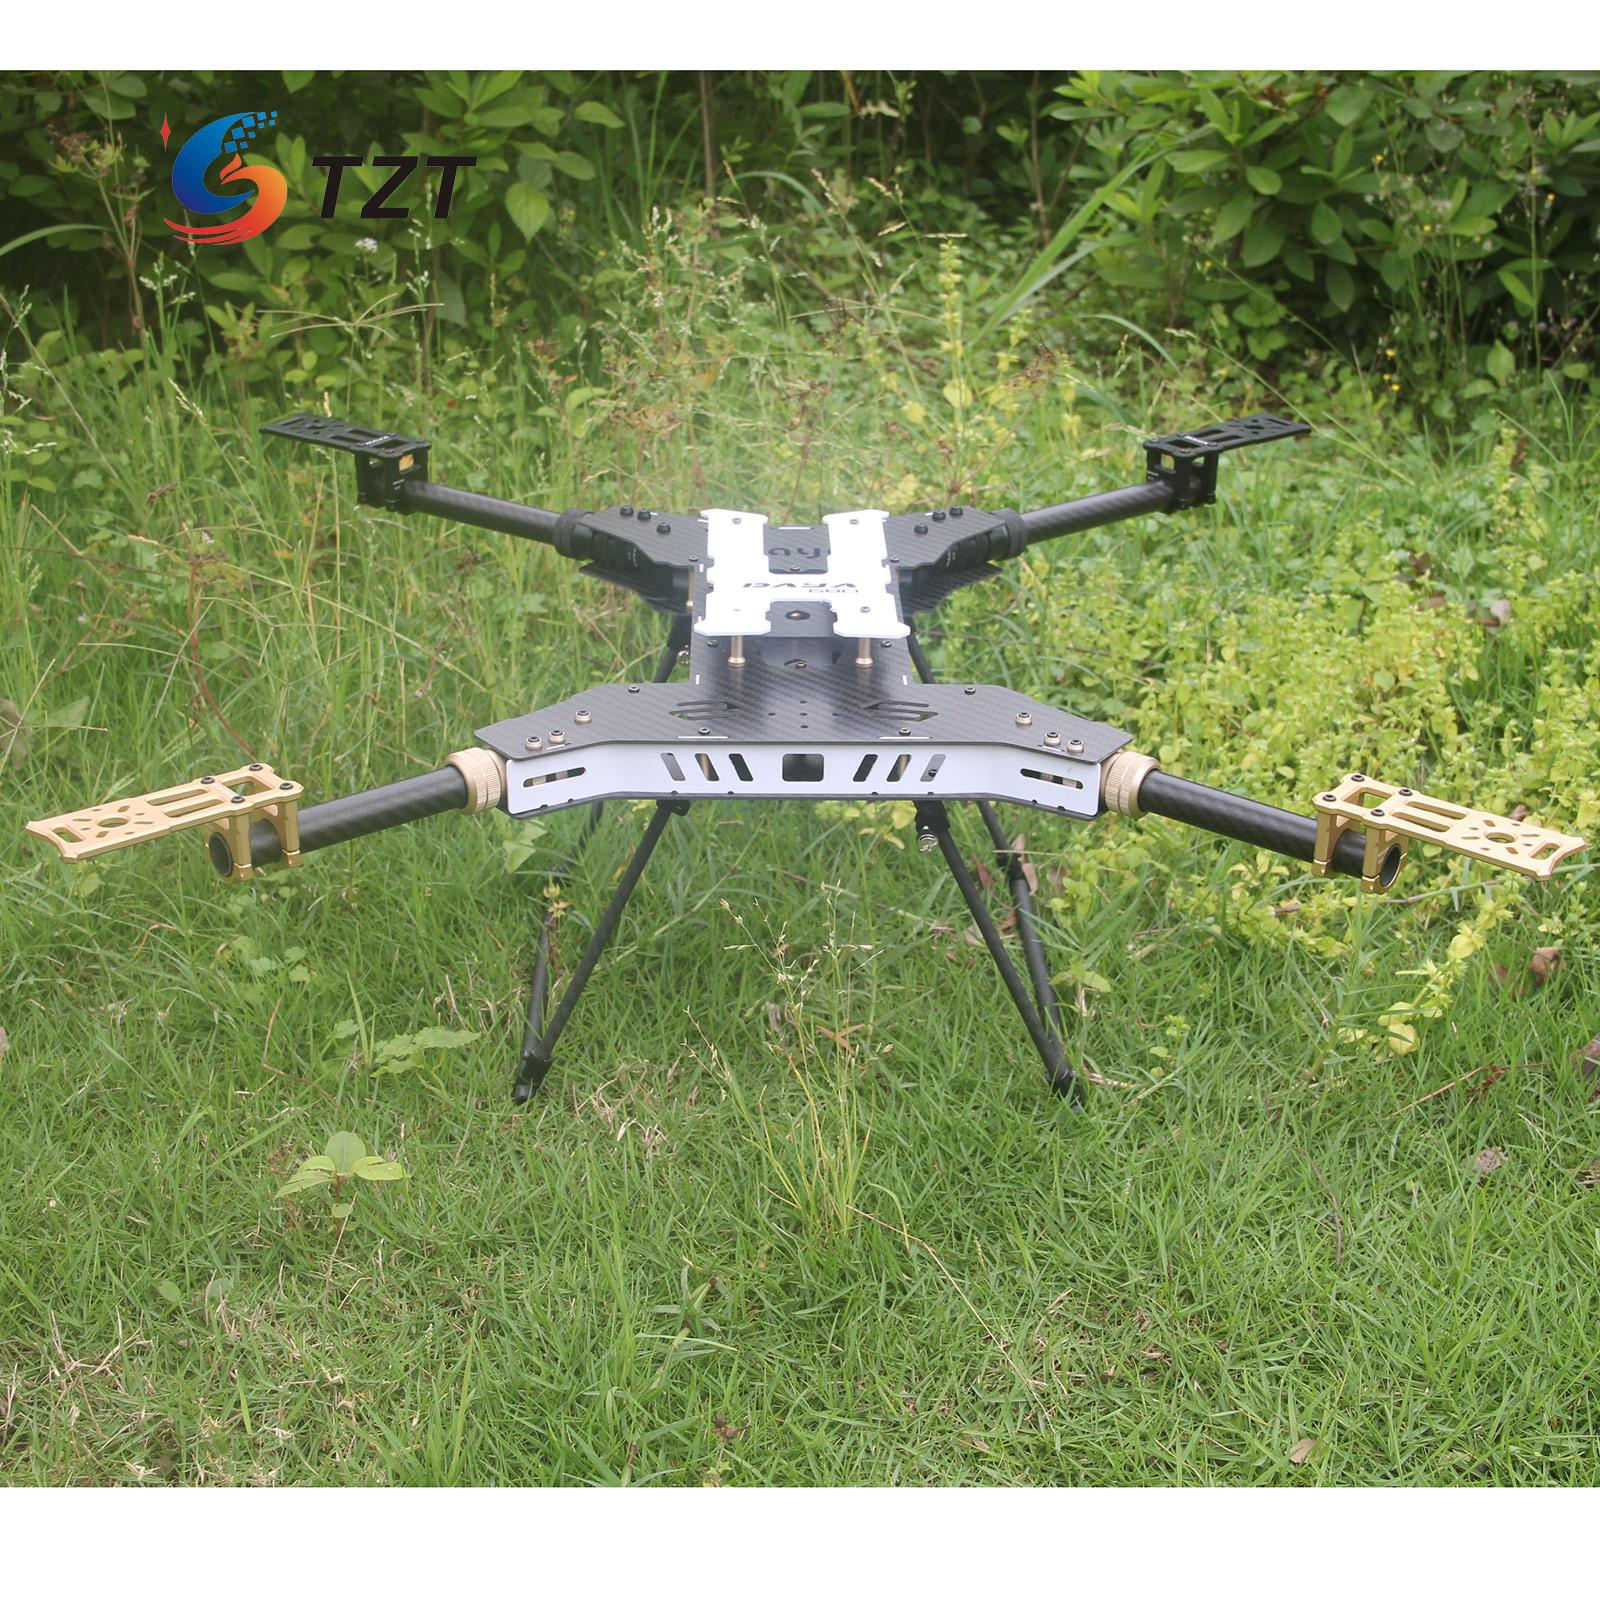 UAV H4 680 Daya Folding 4 Axis Carbon Fiber Quadcopter Frame w Landing Gear for FPV